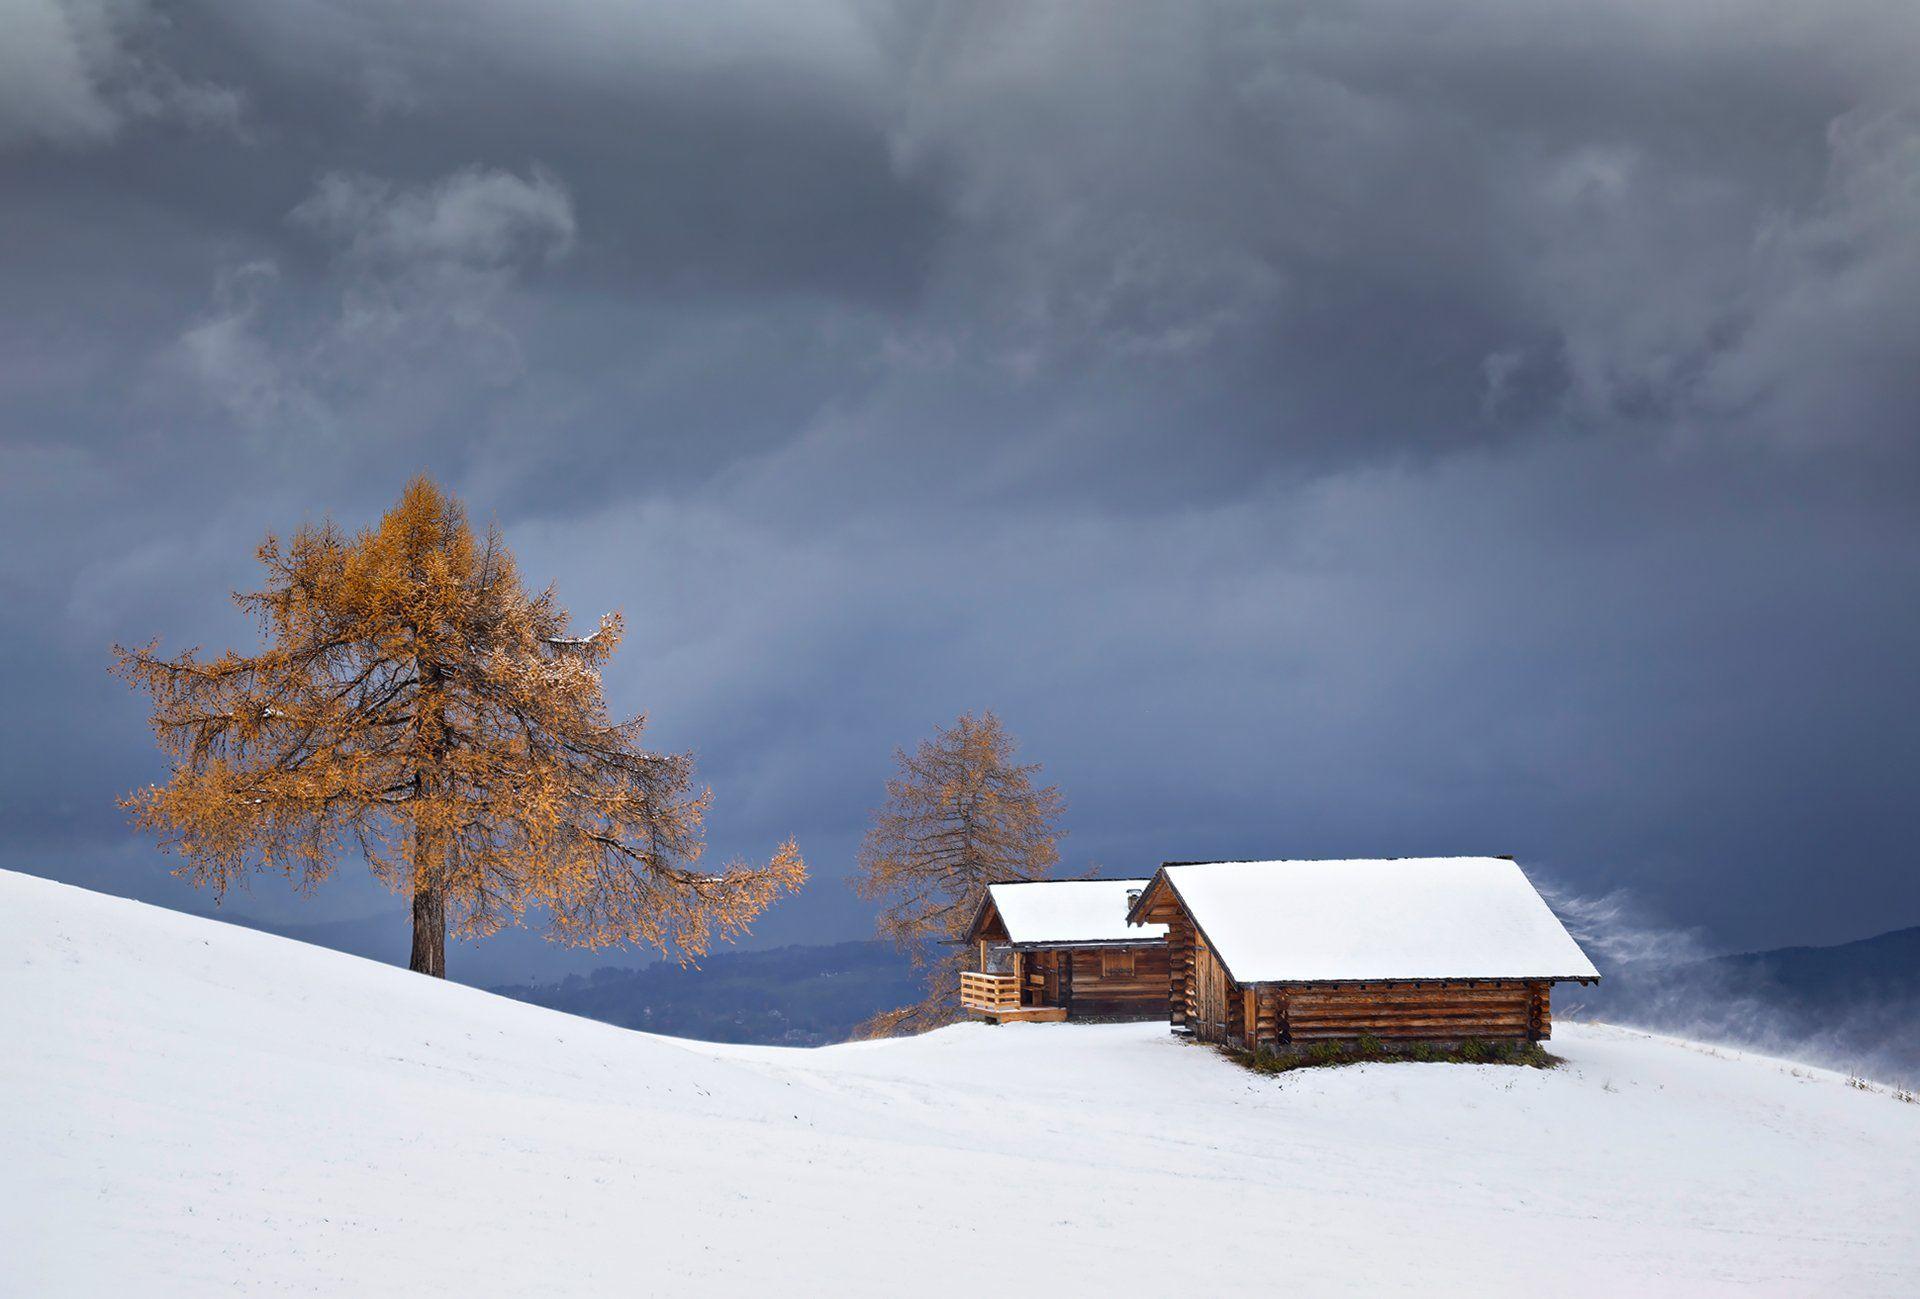 mountains, dolomites, italy, trees, landscape, nature, travel, sunset, autumn, clouds, house, snow, Lazar Ioan Ovidiu